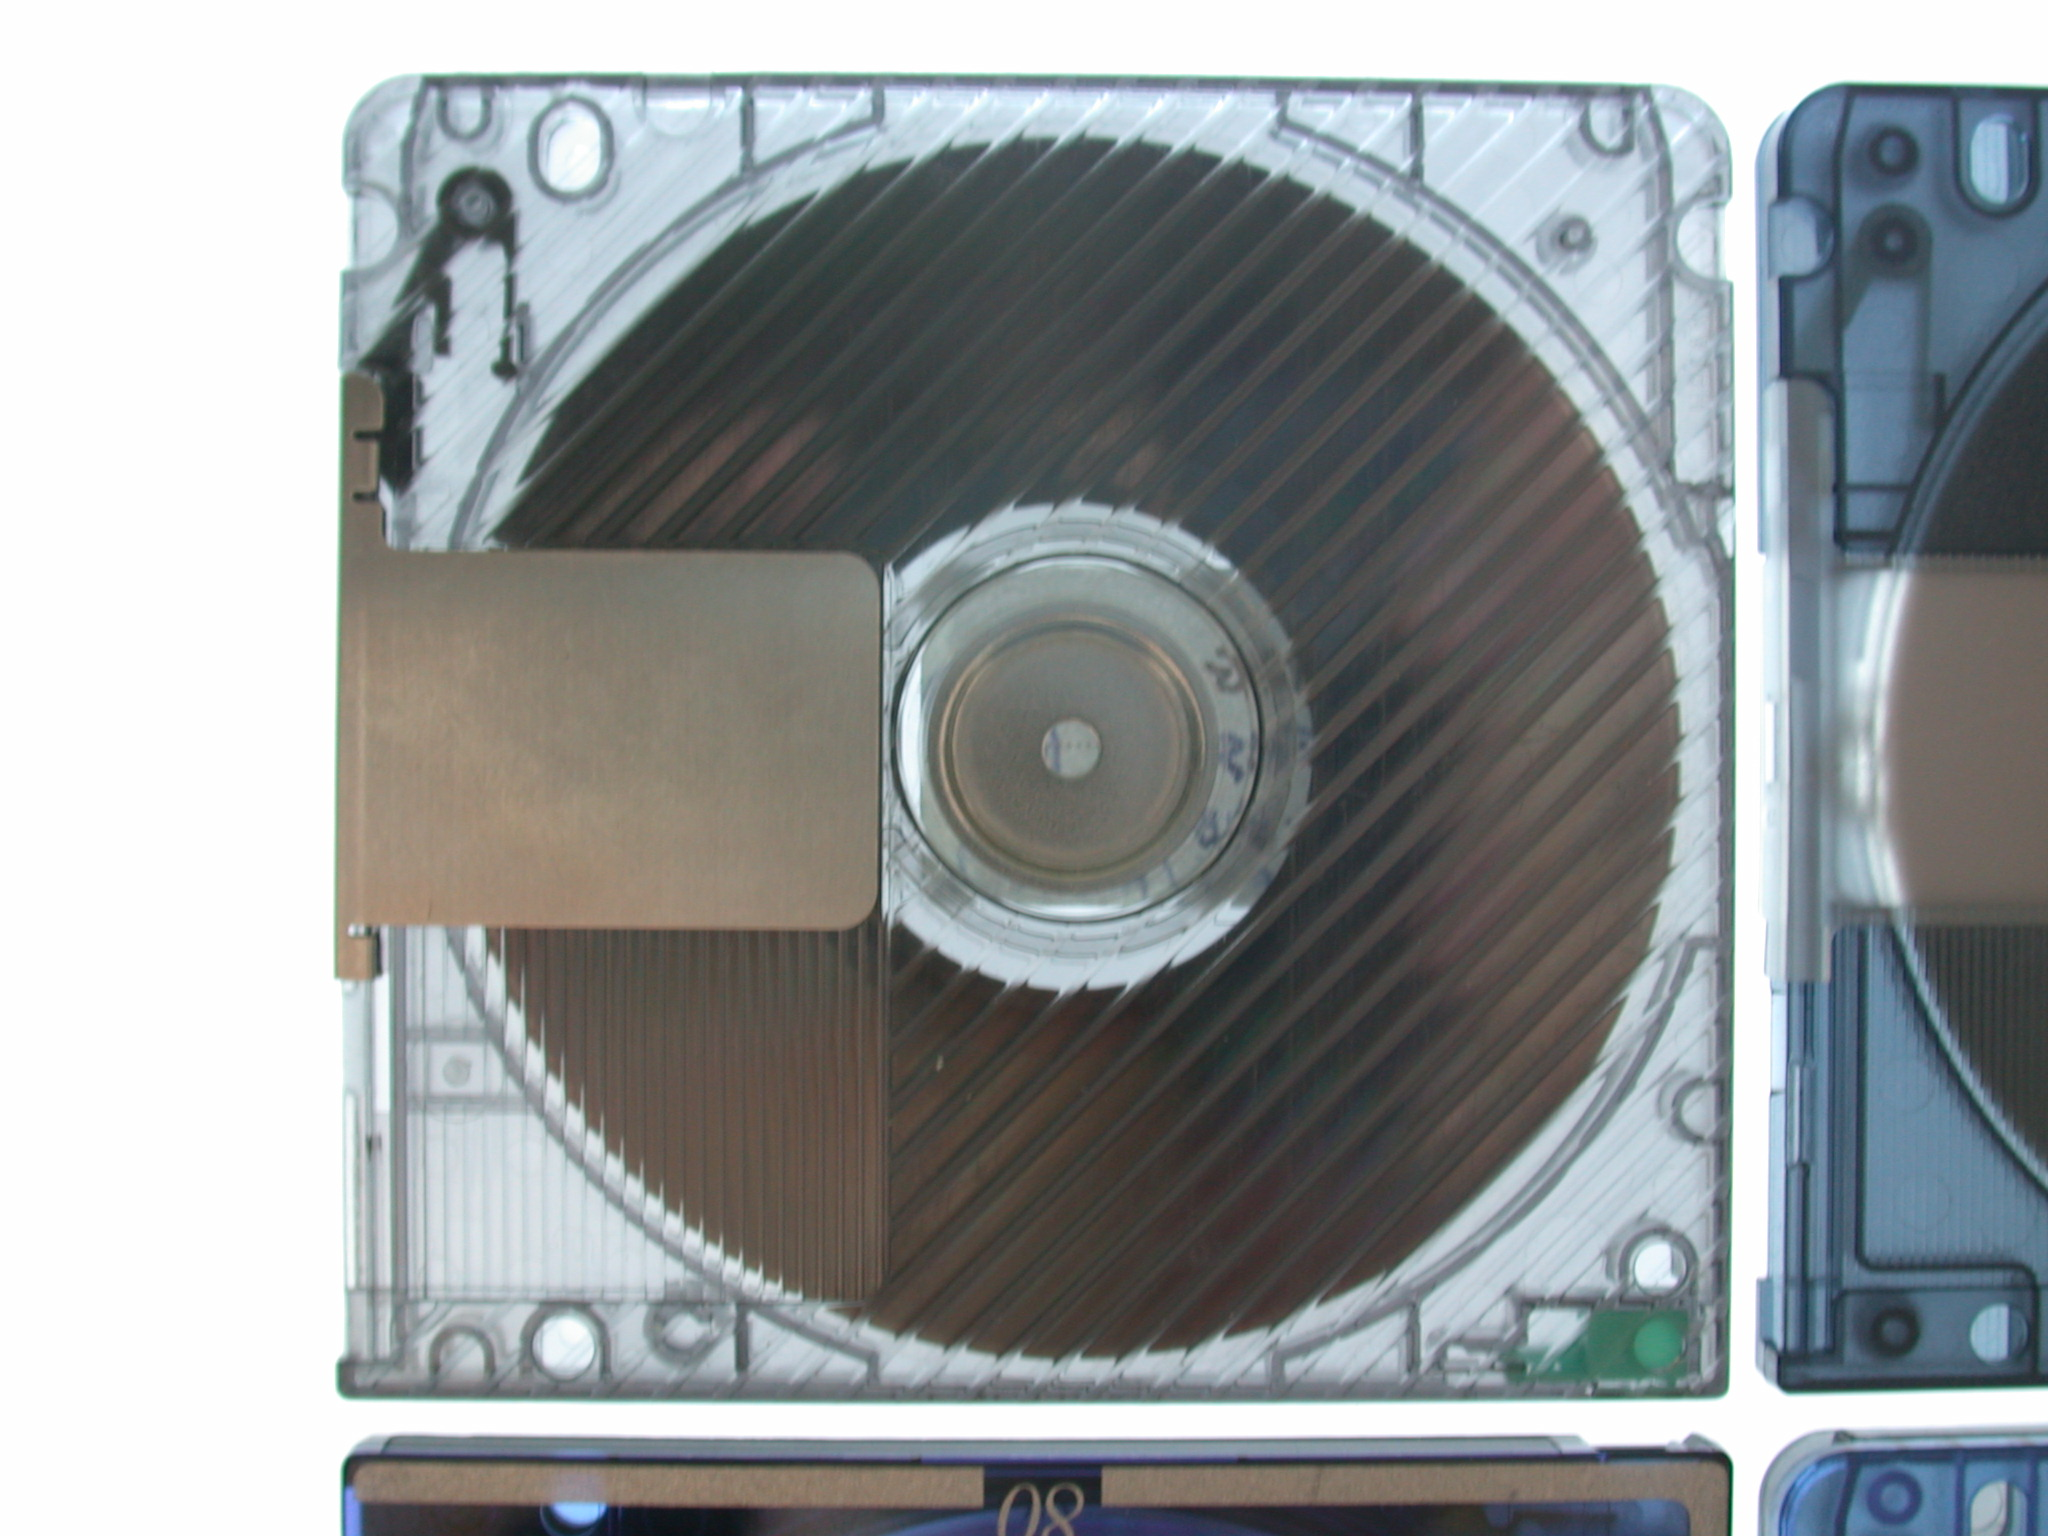 floppy disc disk floppydisk floppydisc floppy-disk floppy-disc 3 5 3.5 inch